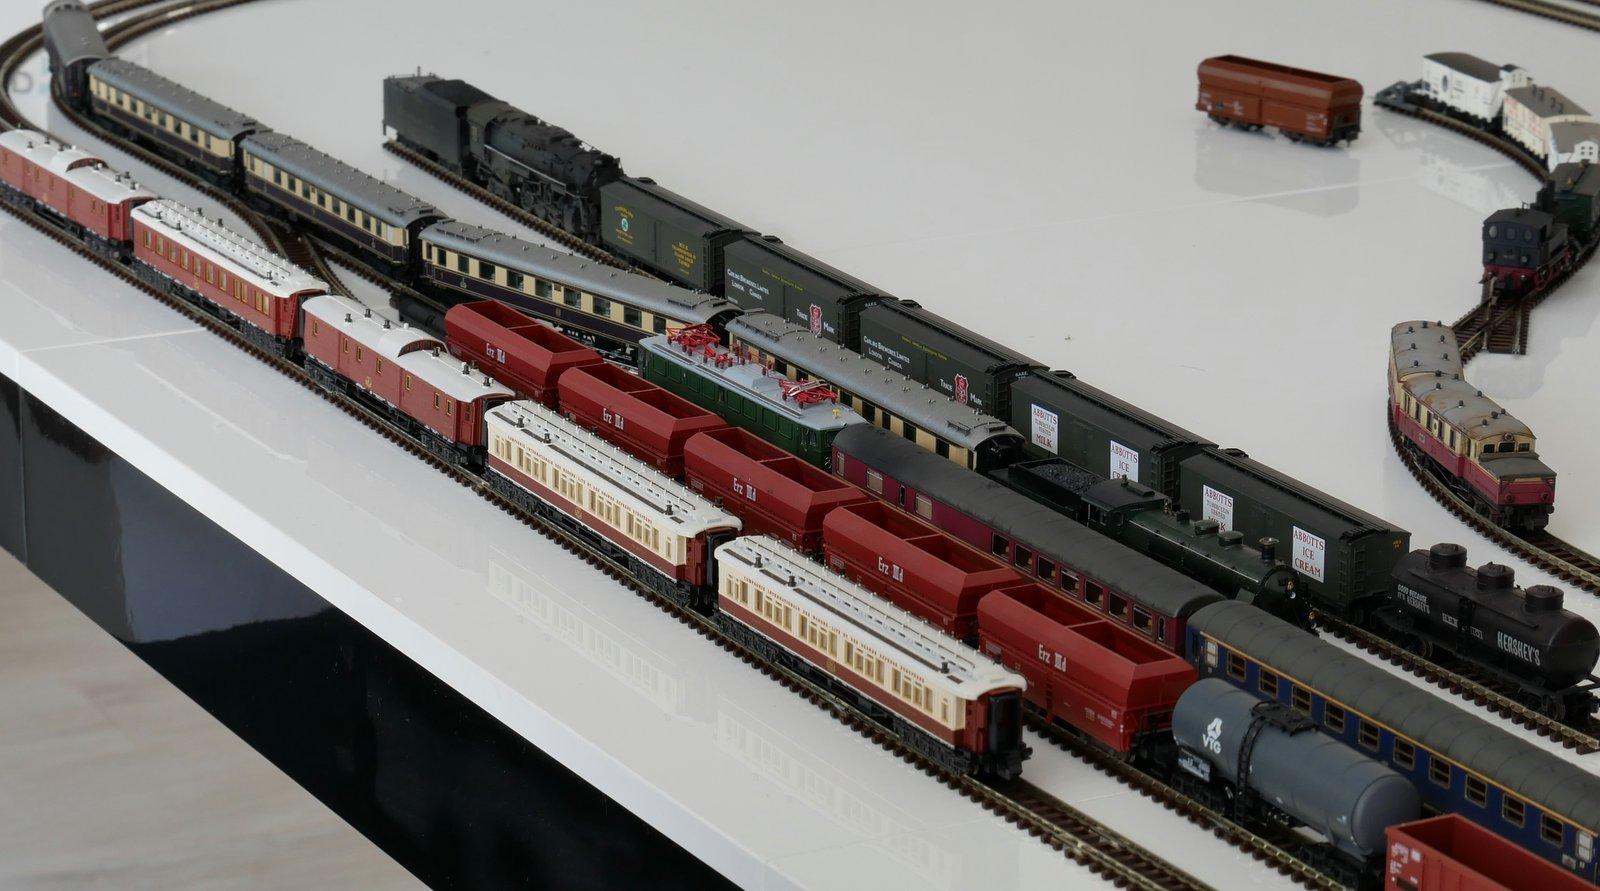 P1190491-001.JPG